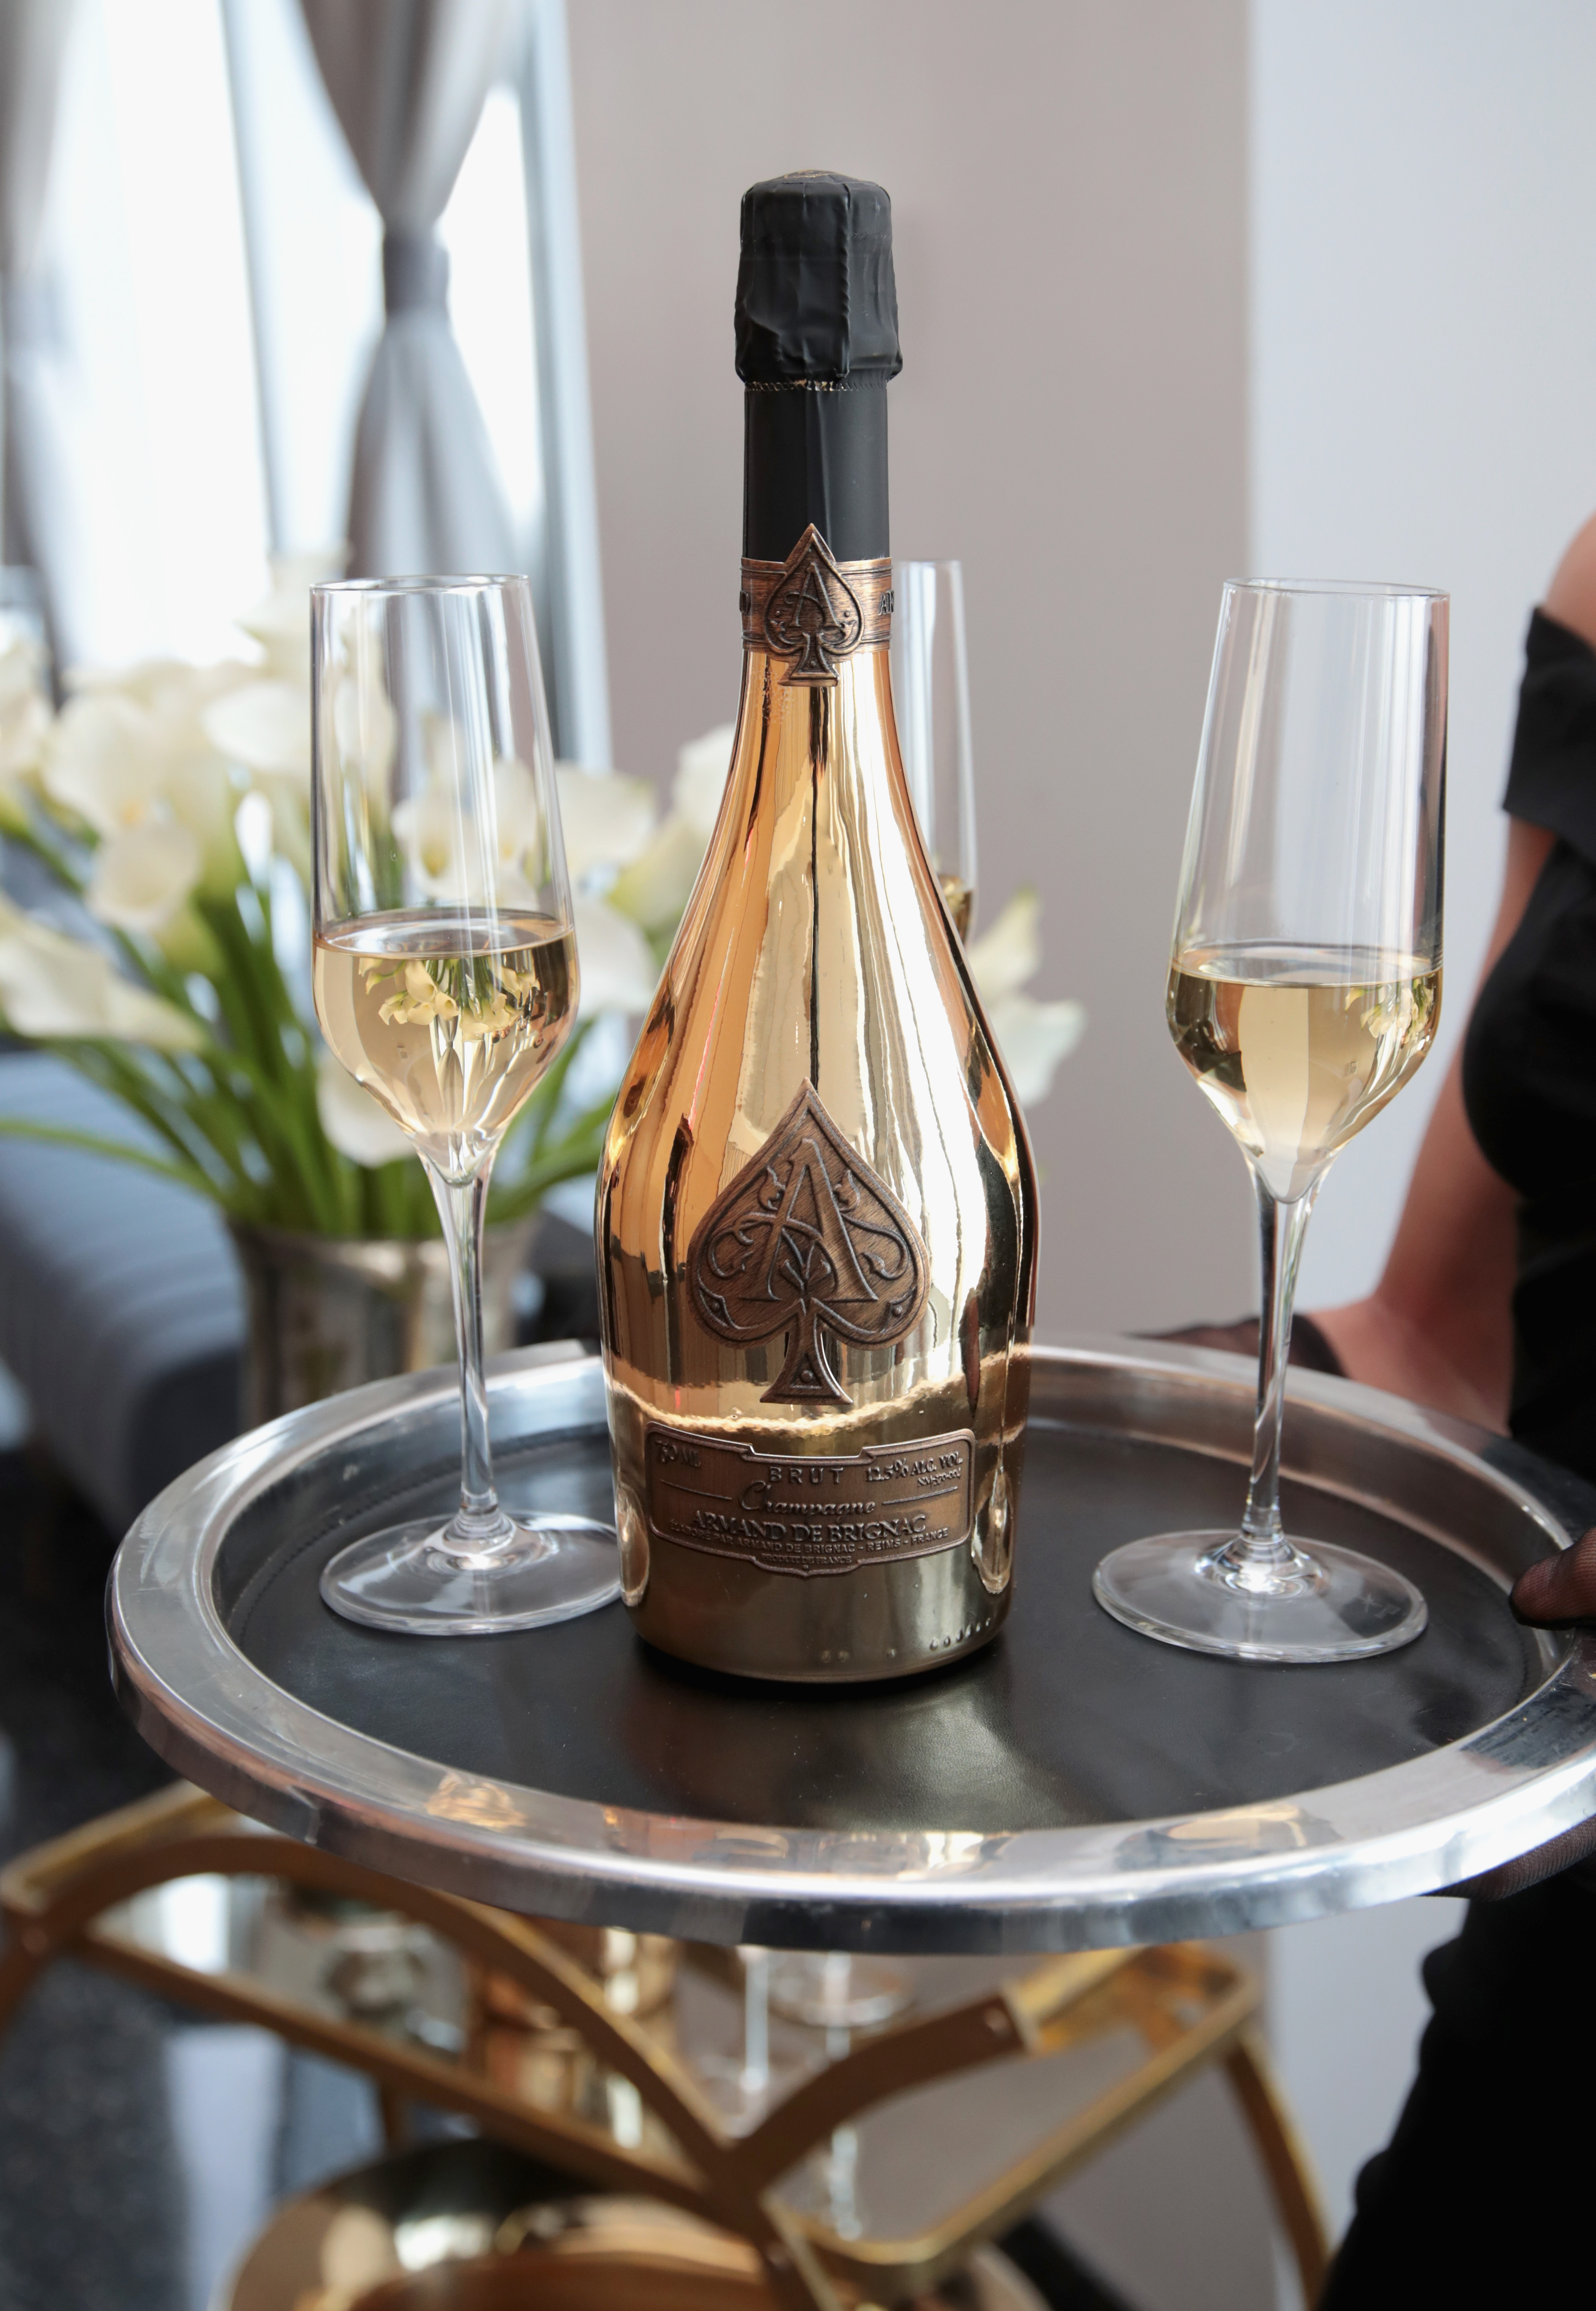 INSIDE THE 7TH ANNUAL ROC NATION BRUNCH - Armand de Brignac Champagne